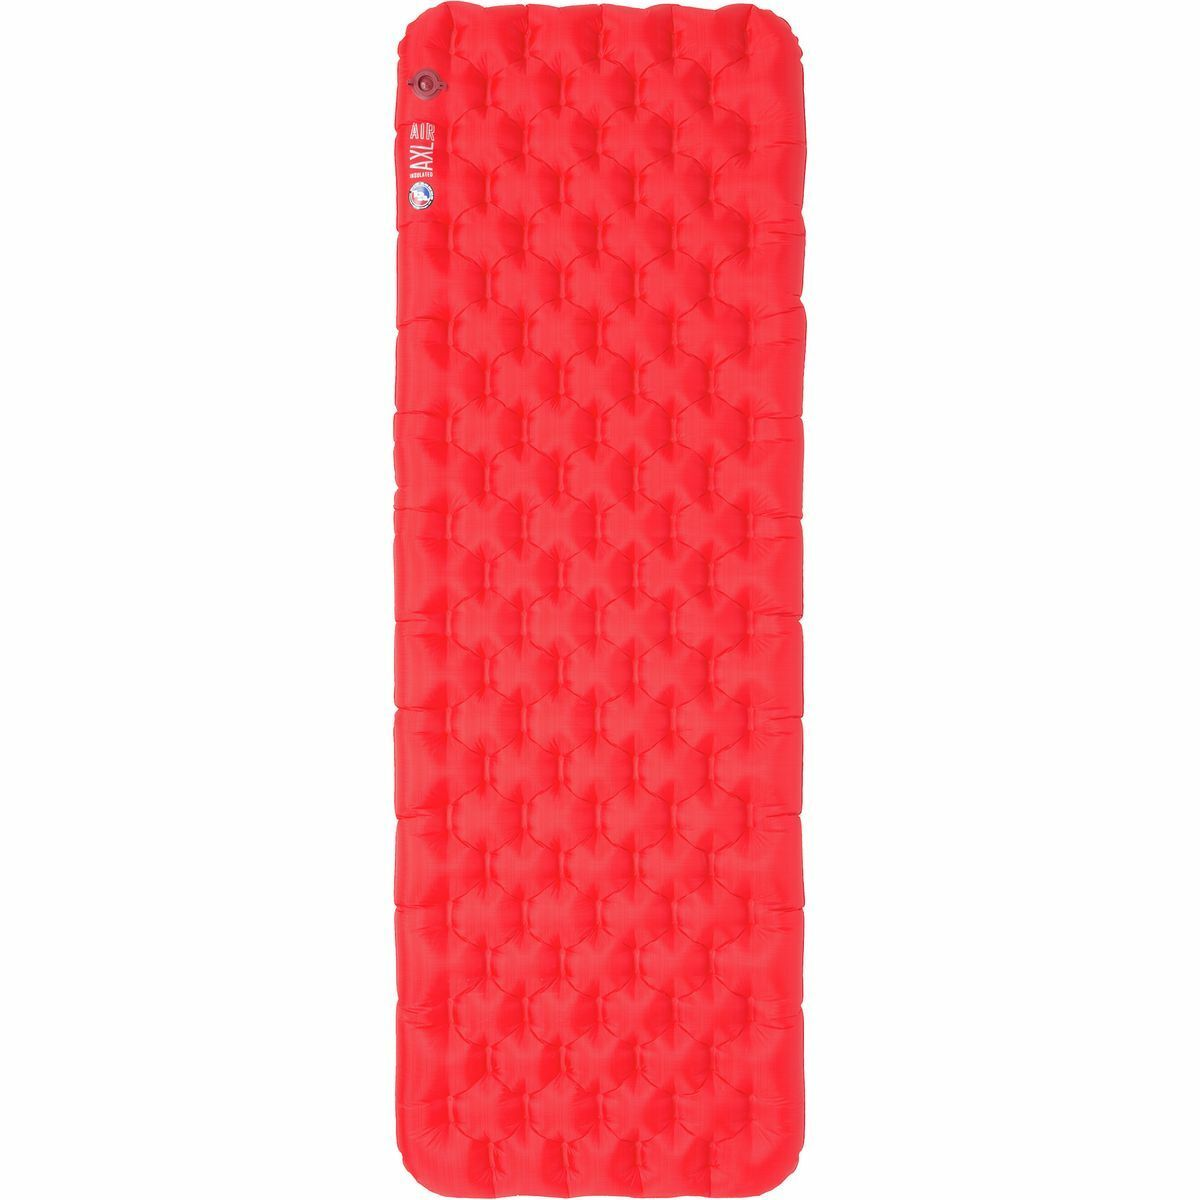 Big Agnes Insulated AXL Air Sleeping Pad Red 25x72 Wide Regular